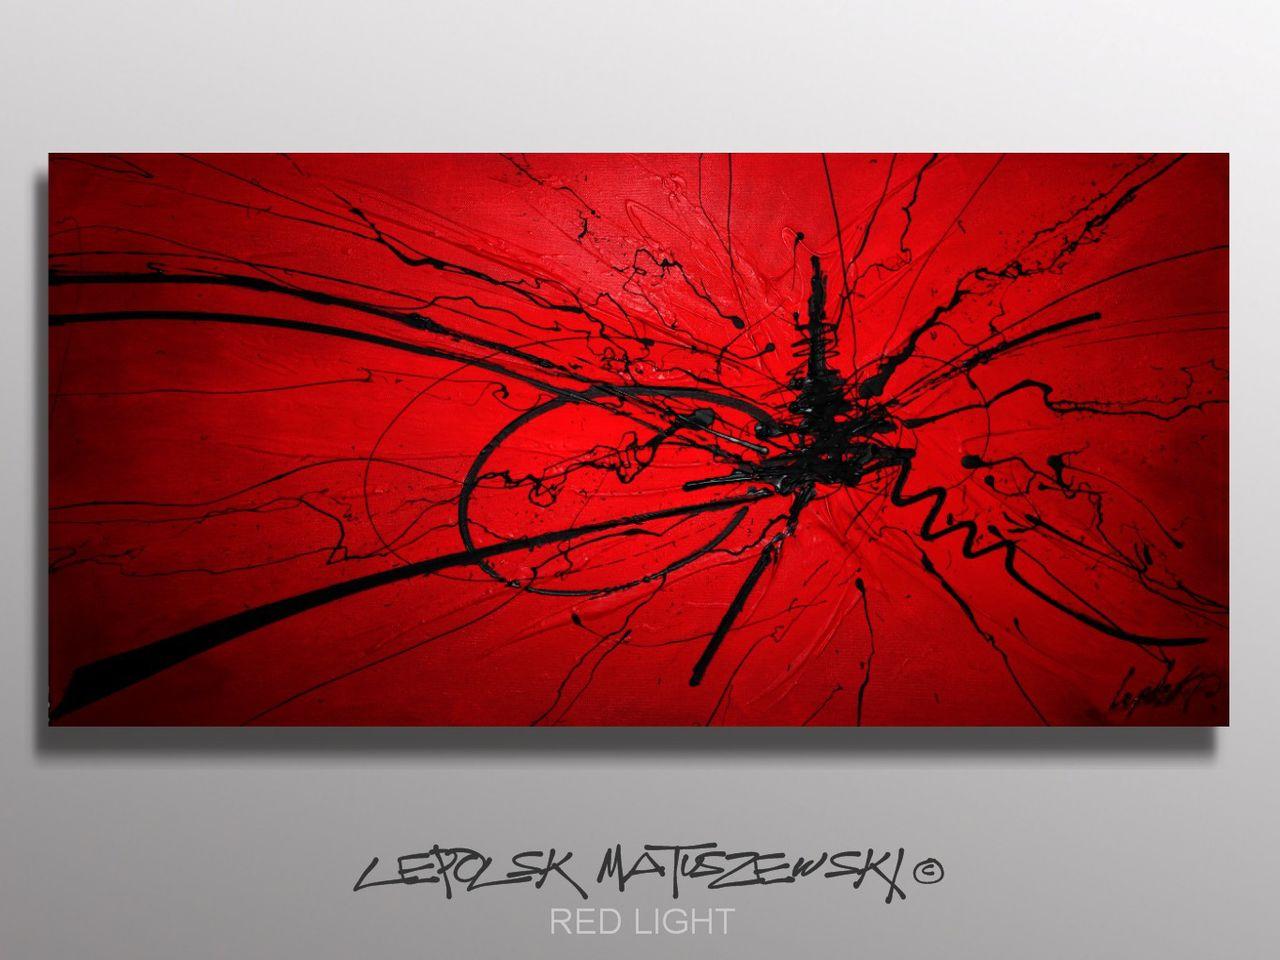 LEPOLSK MATUSZEWSKI RED LIGHT   Expressionnisme abstrait contemporain